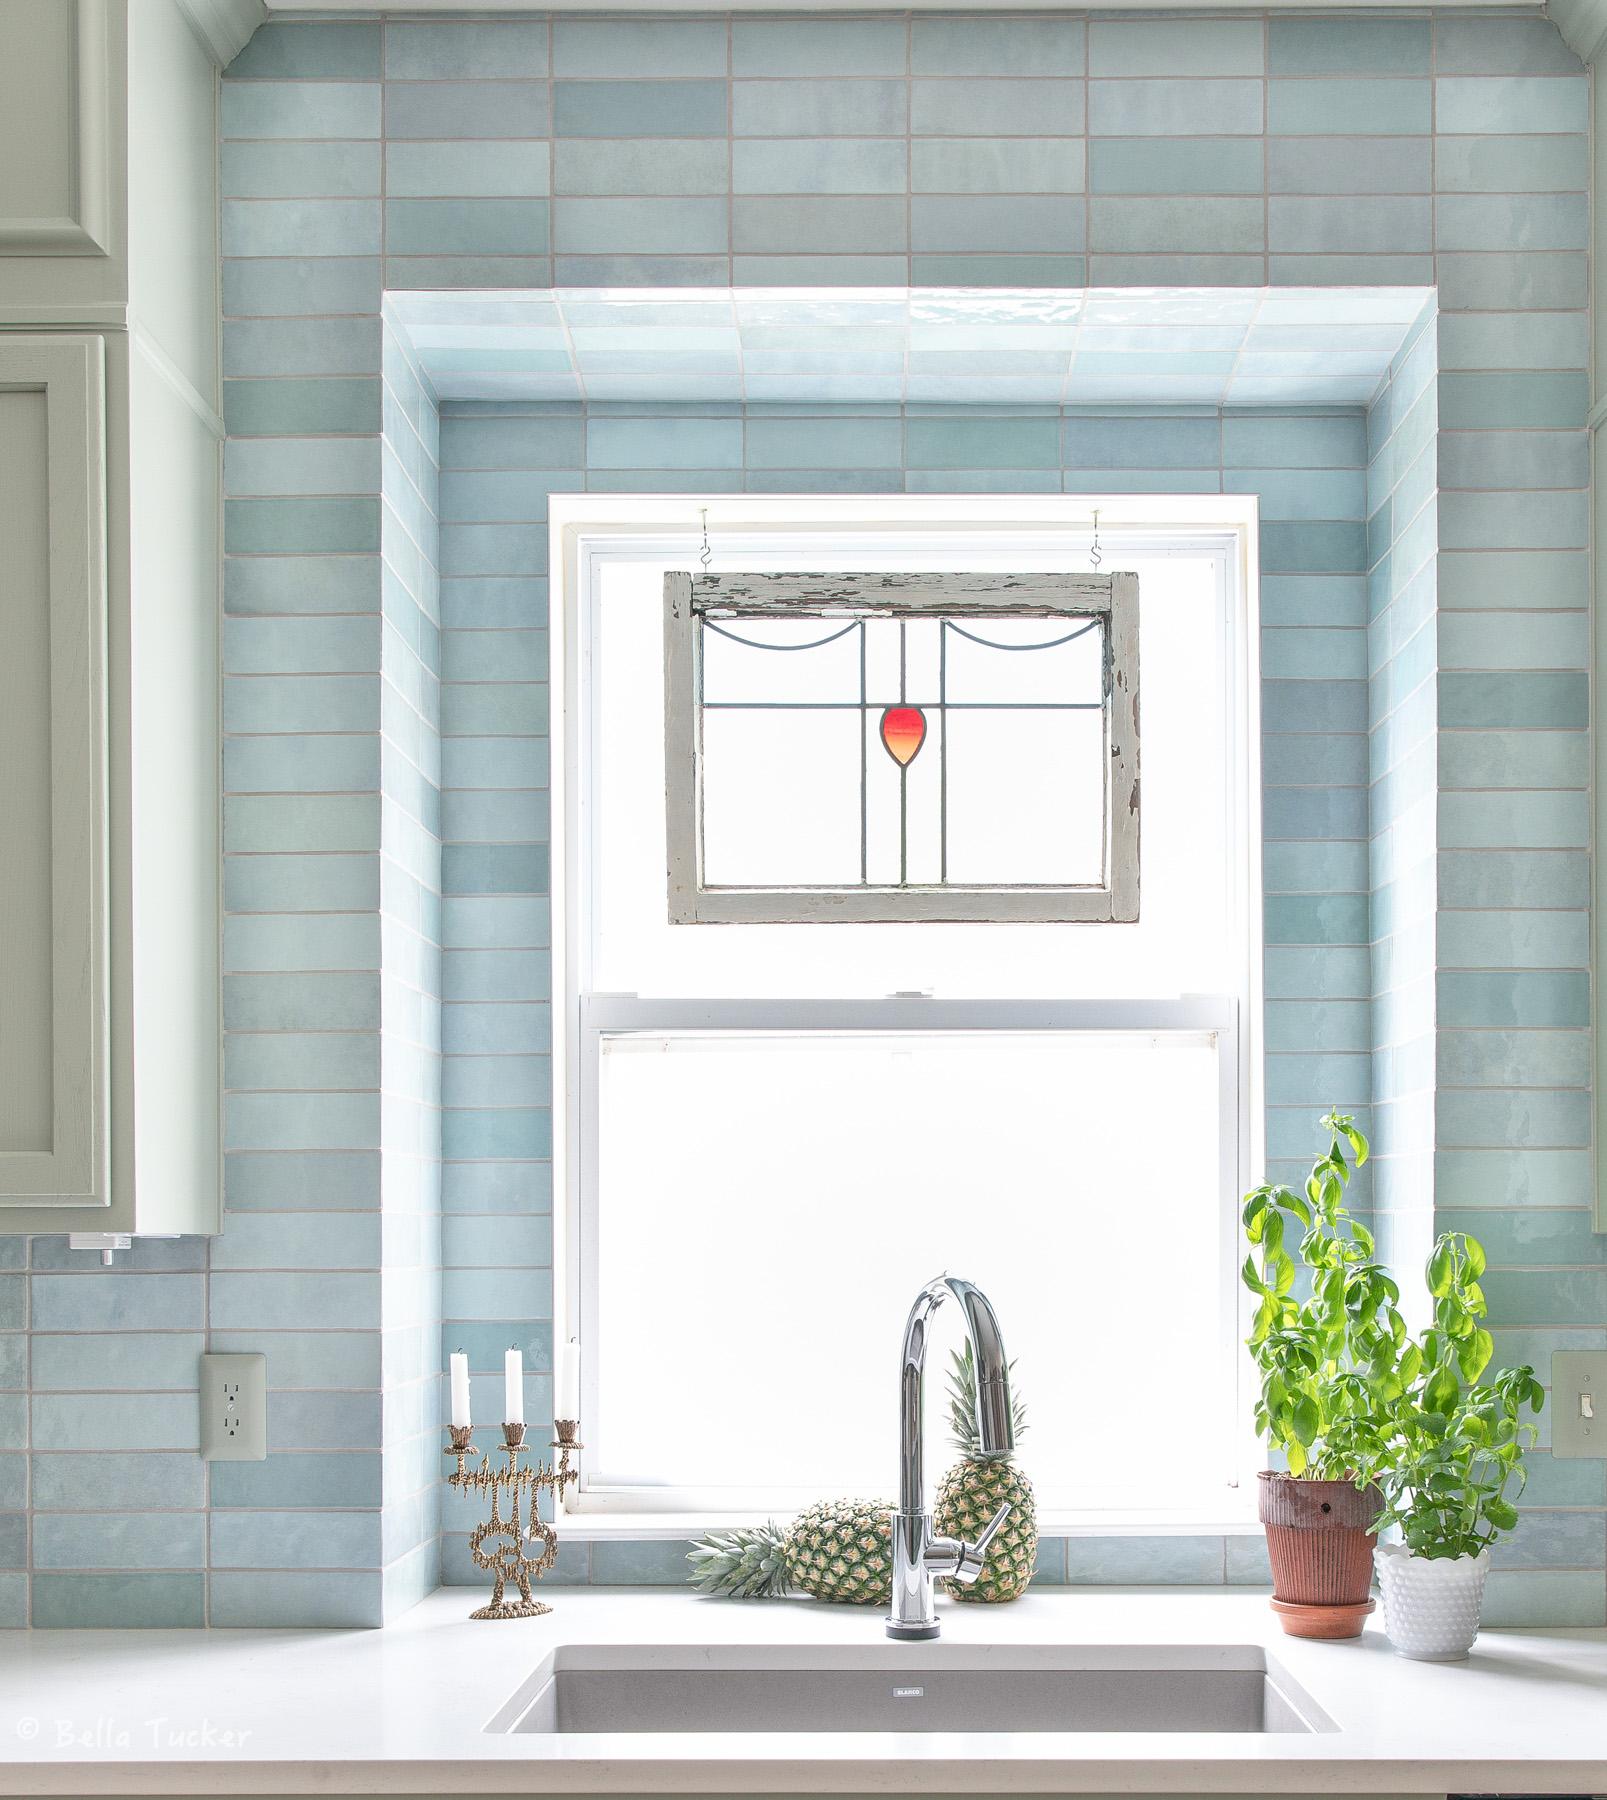 window backsplash tile install